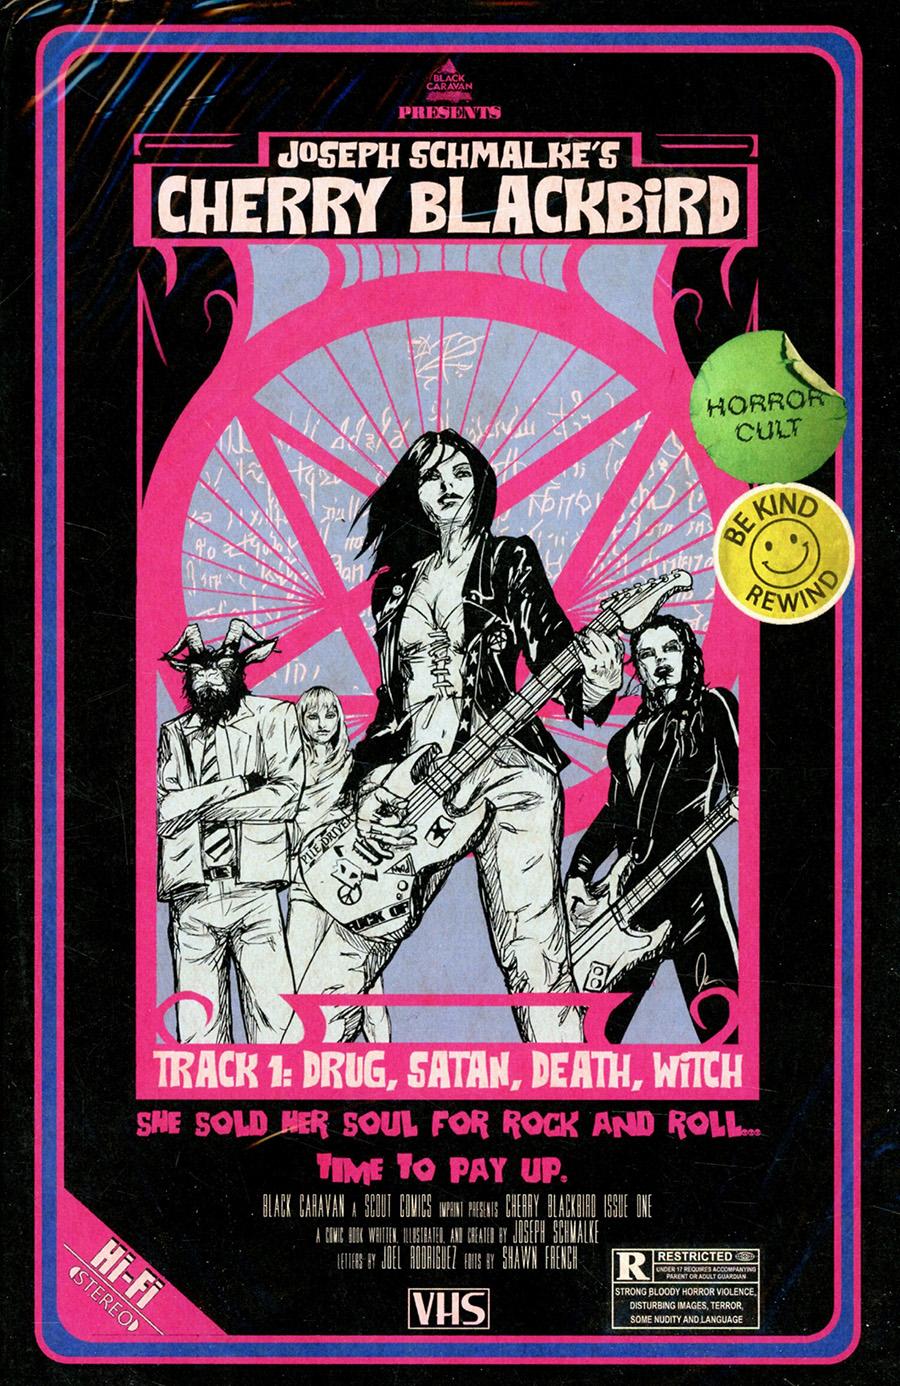 Cherry Blackbird #1 Cover B Secret VHS Variant With Polybag (Limit 1 Per Customer)